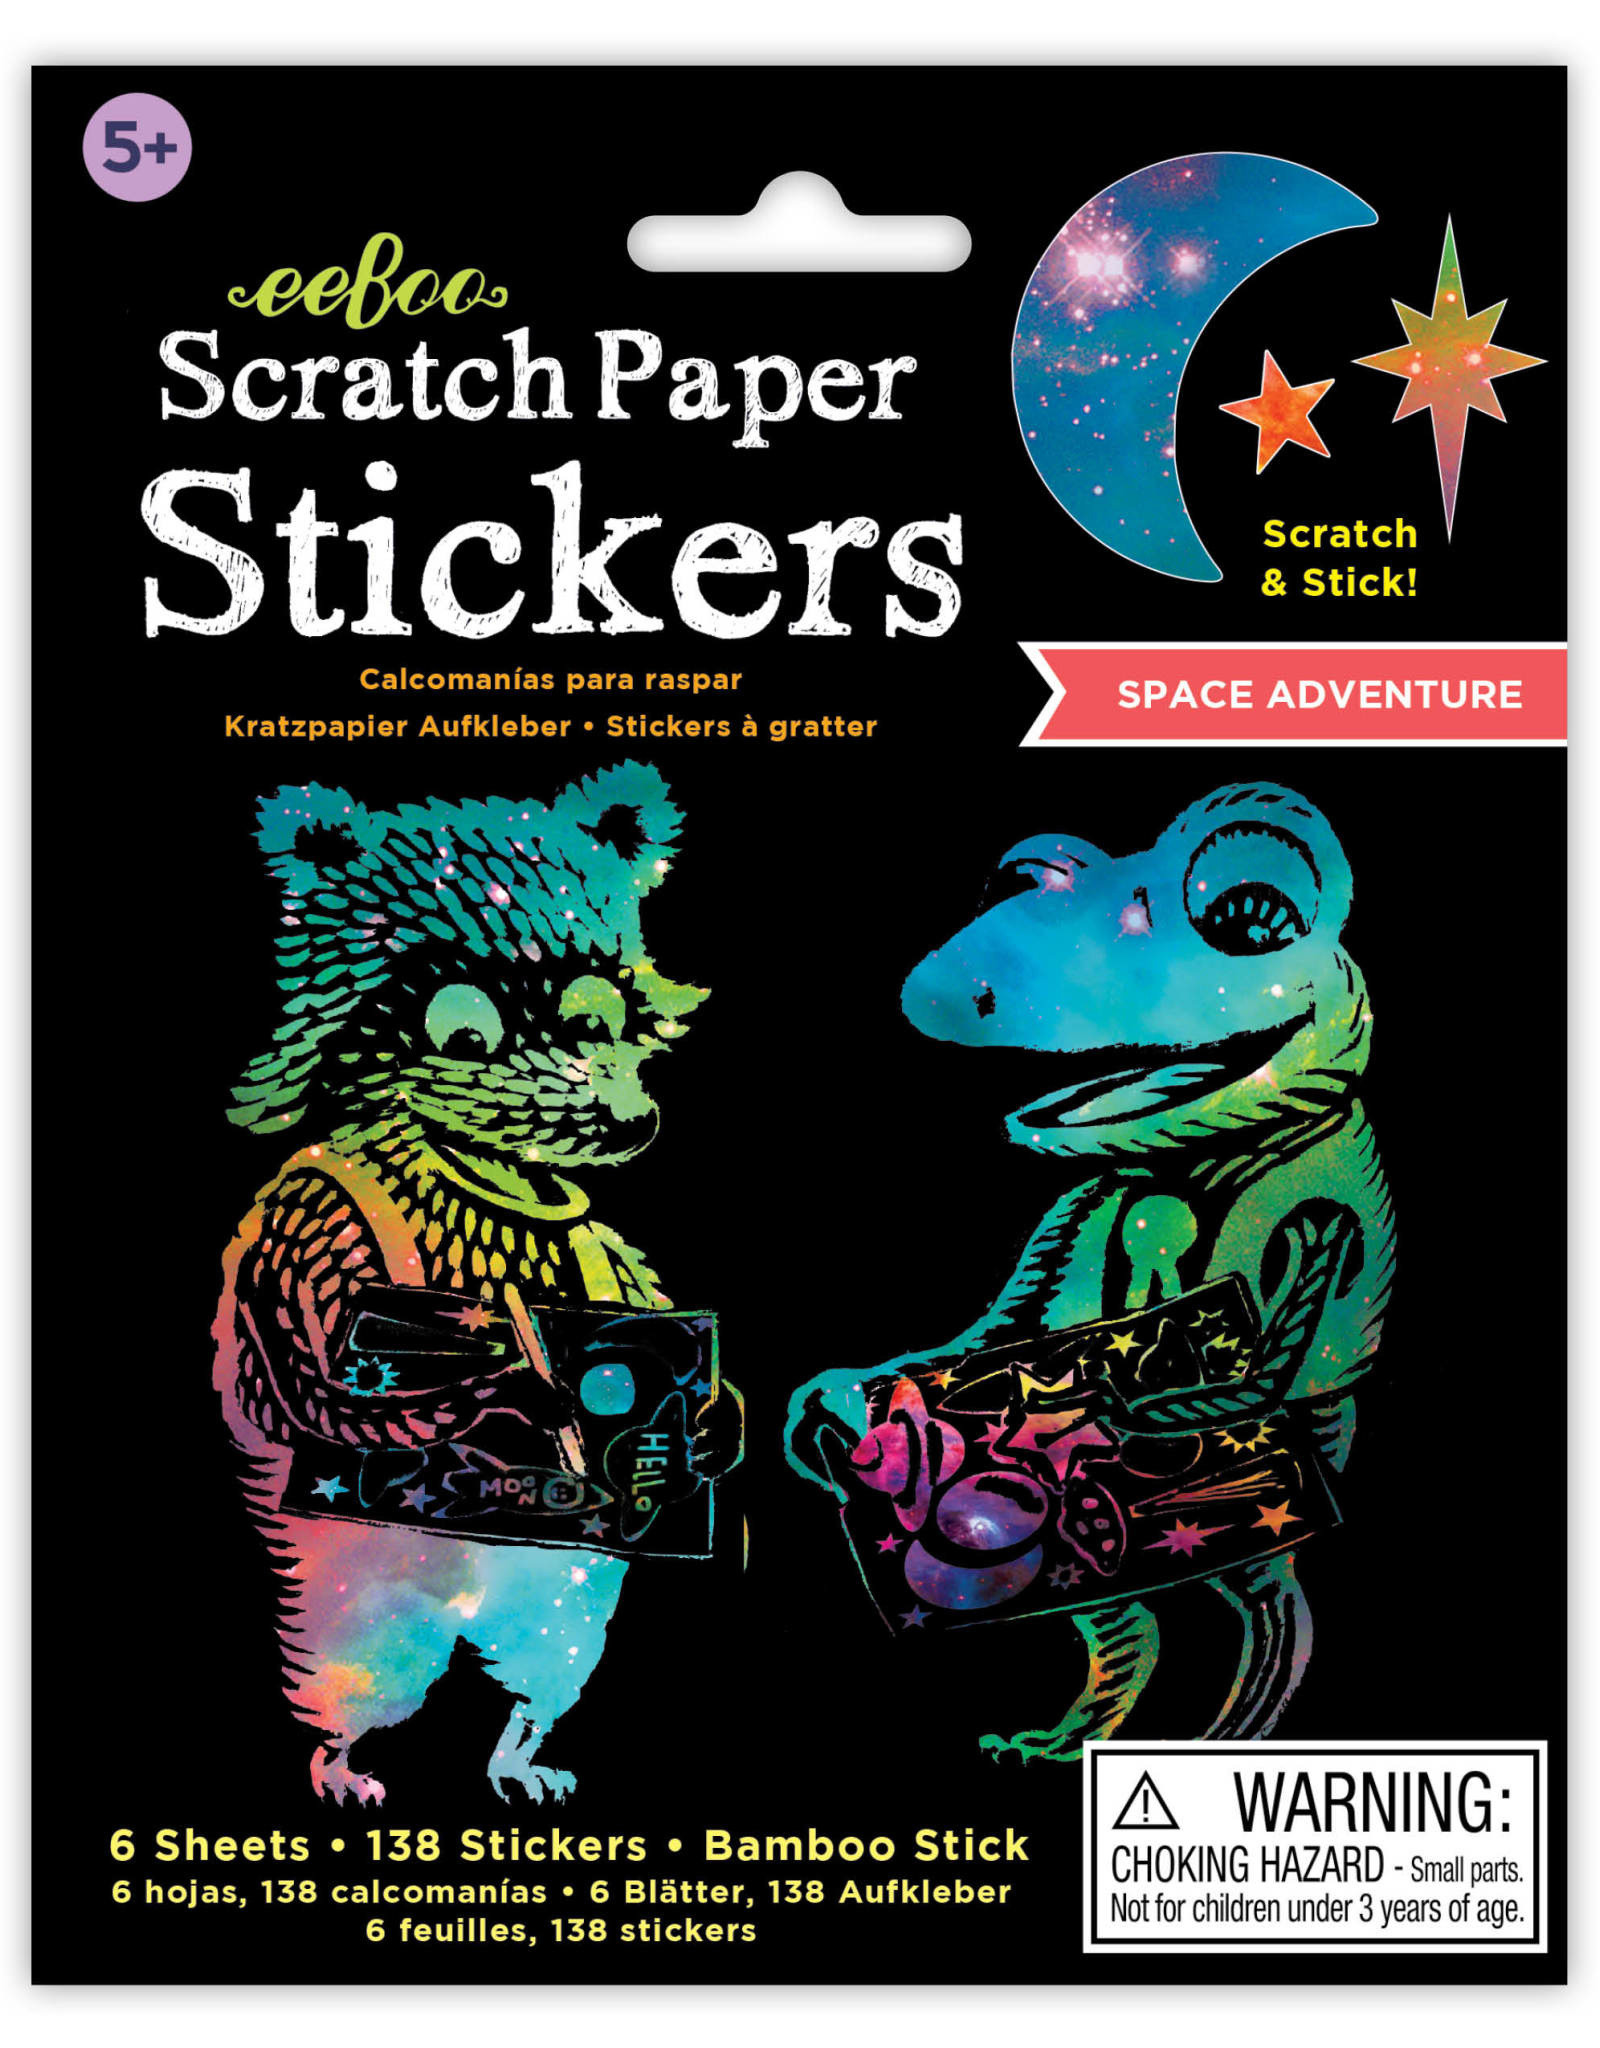 eeBoo Space Adventure Scratch Paper Stickers